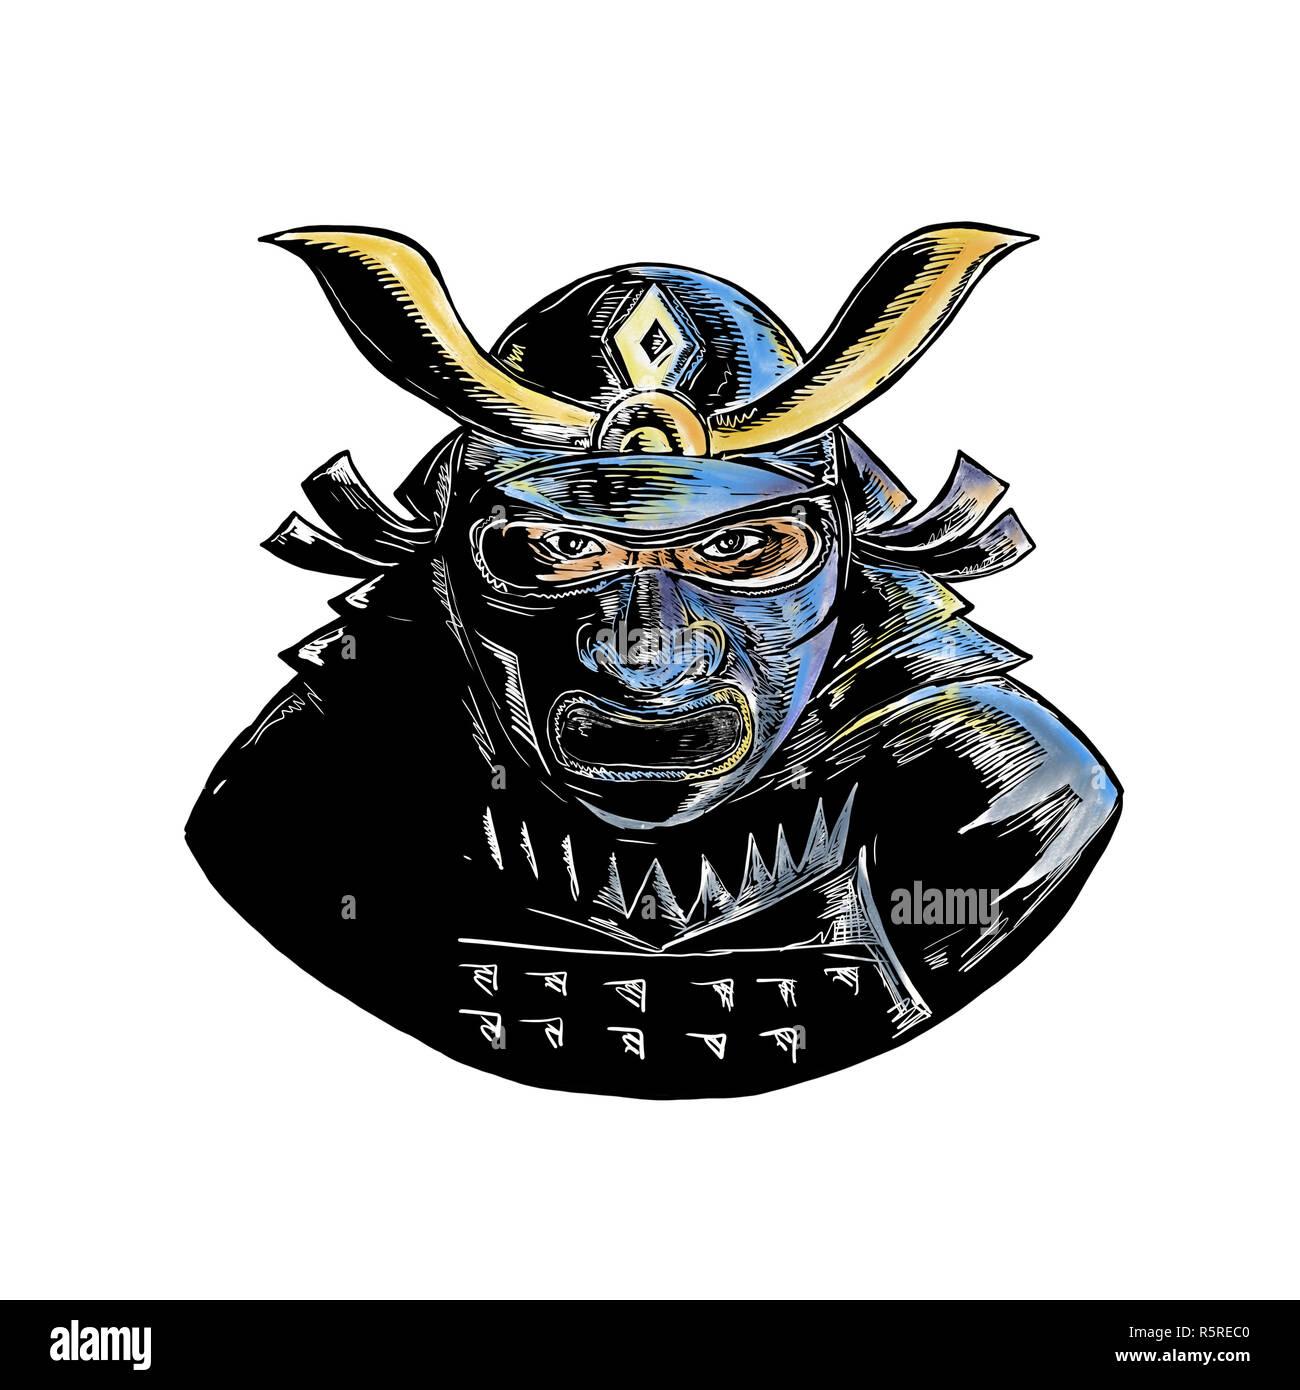 Samurai Wearing Armor Mask Mempo Woodcut - Stock Image